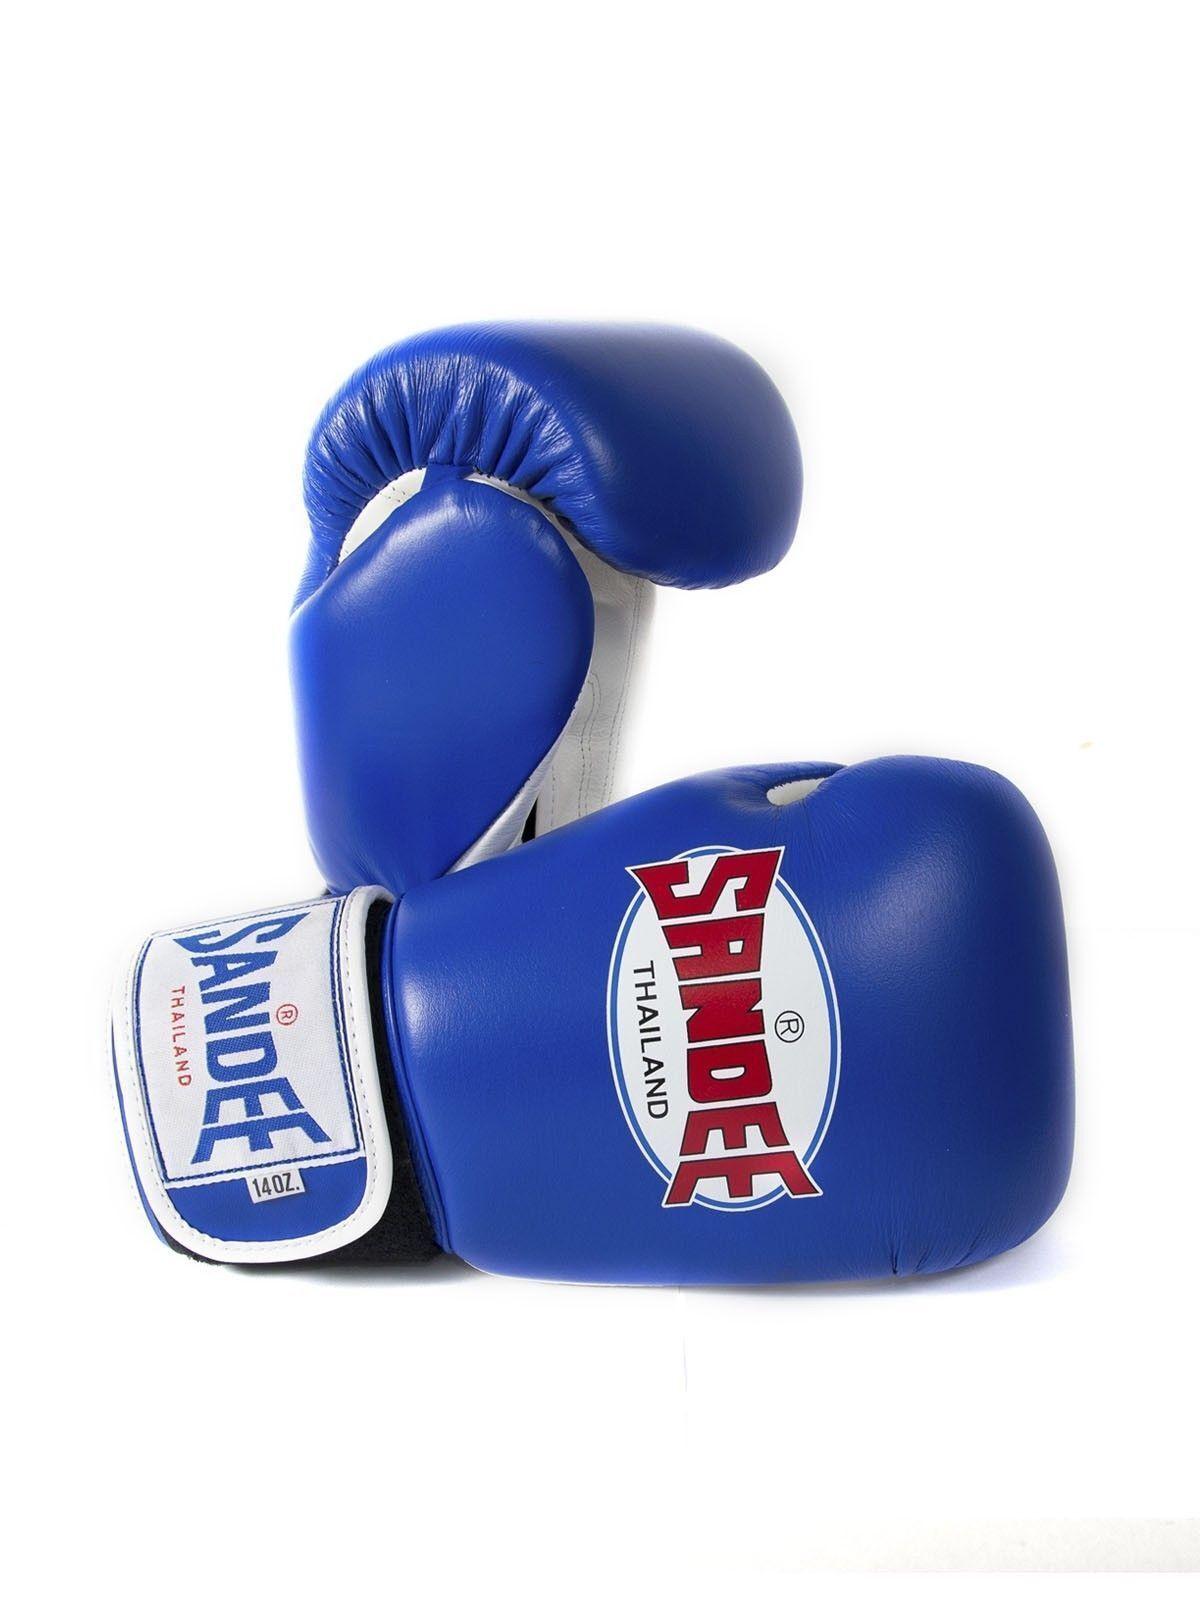 Sandee Authentic Muay Thai Blau & Weiß Leder Boxing Gloves Sparring